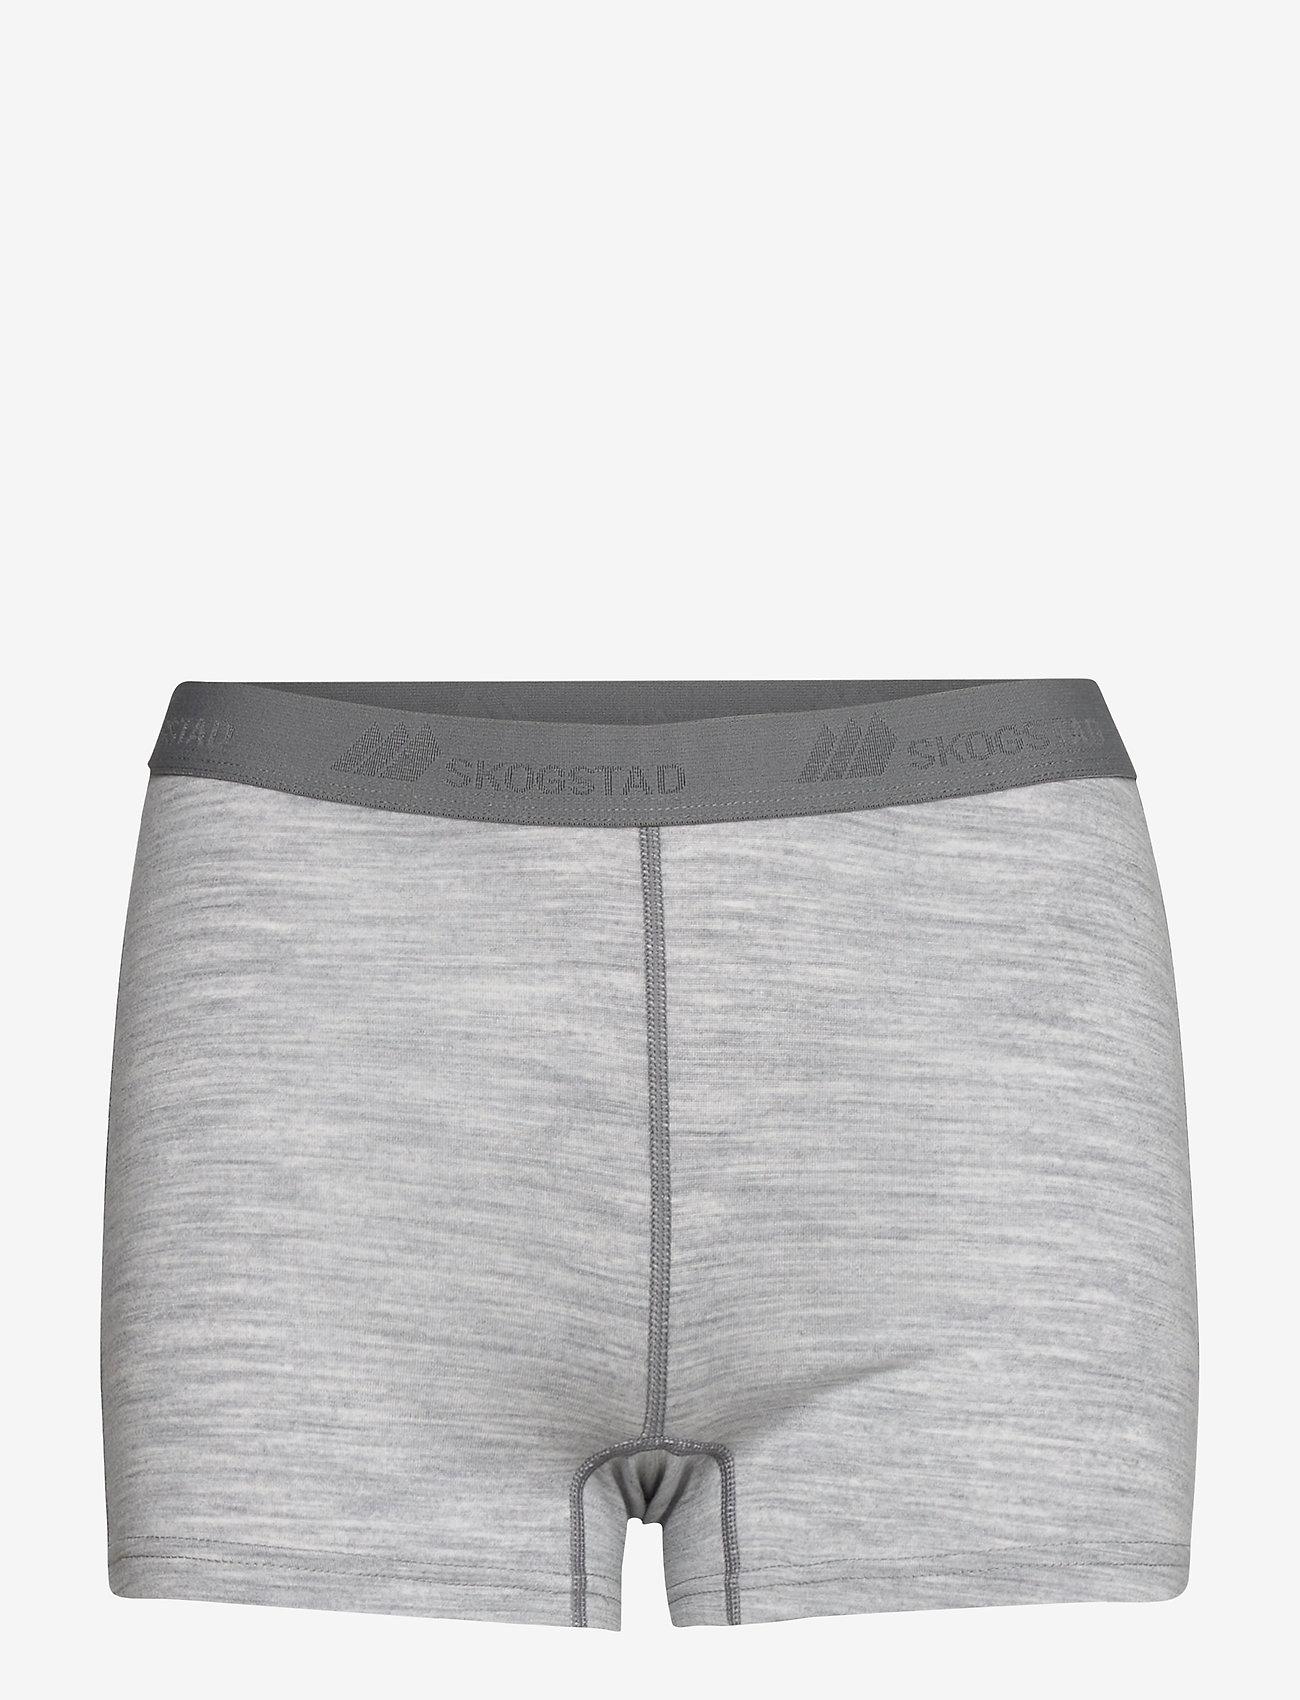 Skogstad - Mysen Merino Wool Hipster - slips - grey melange - 0